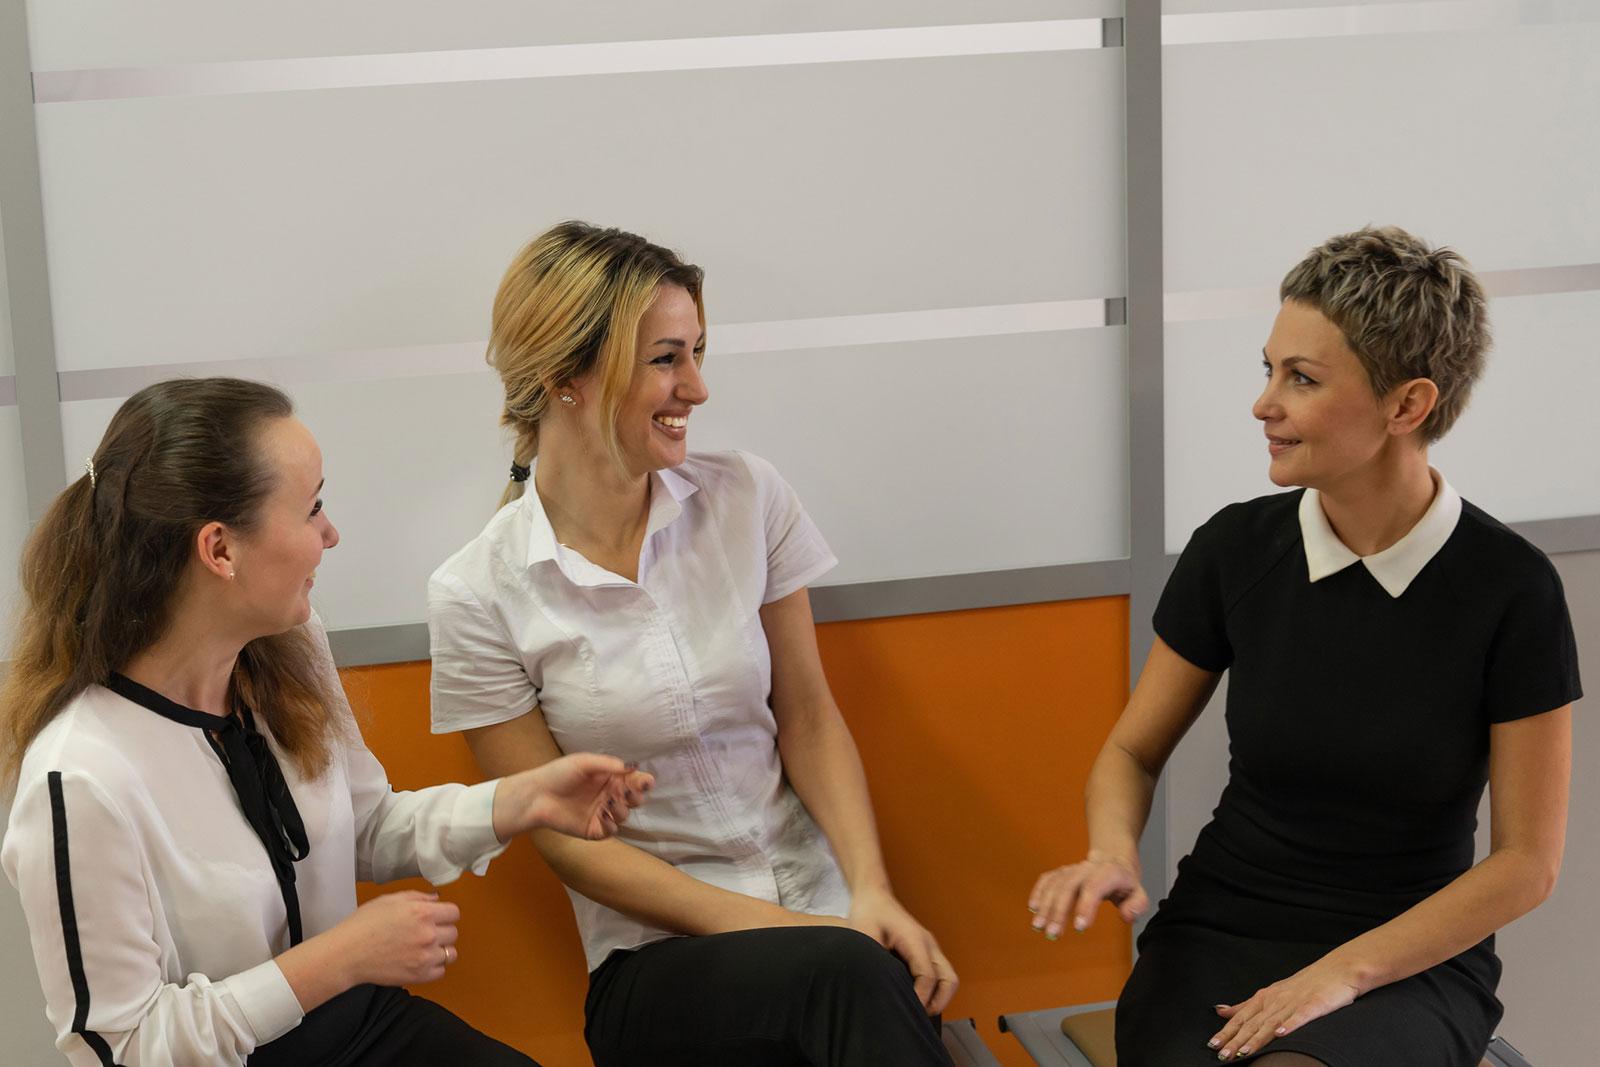 Image featuring women chatting in school staffroom.